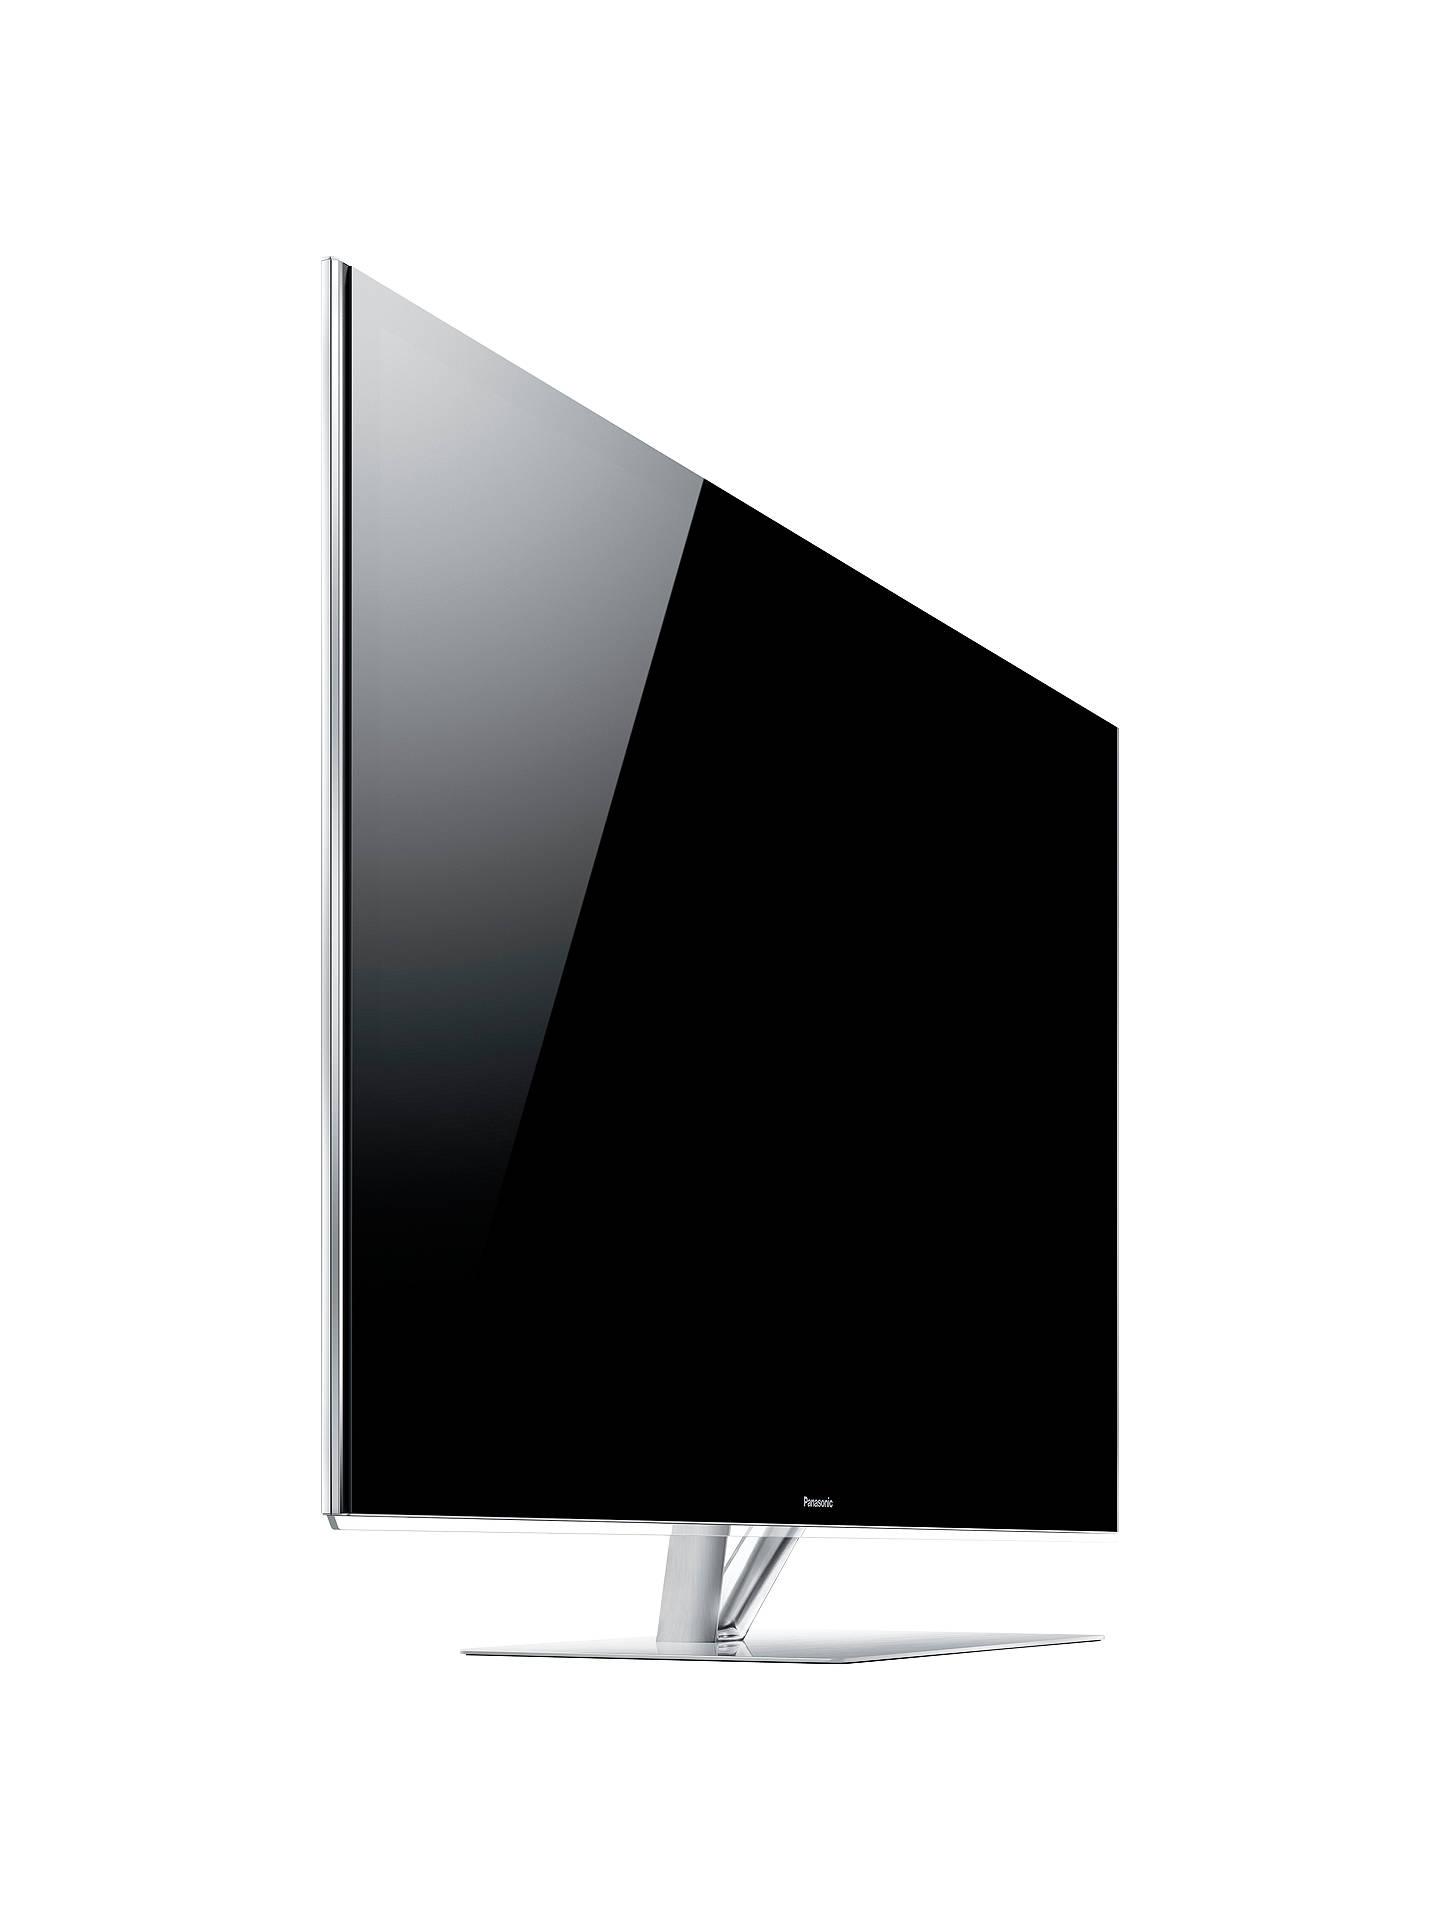 Panasonic Viera TX-P55VT65B Plasma HD 1080p 3D Smart TV, 55